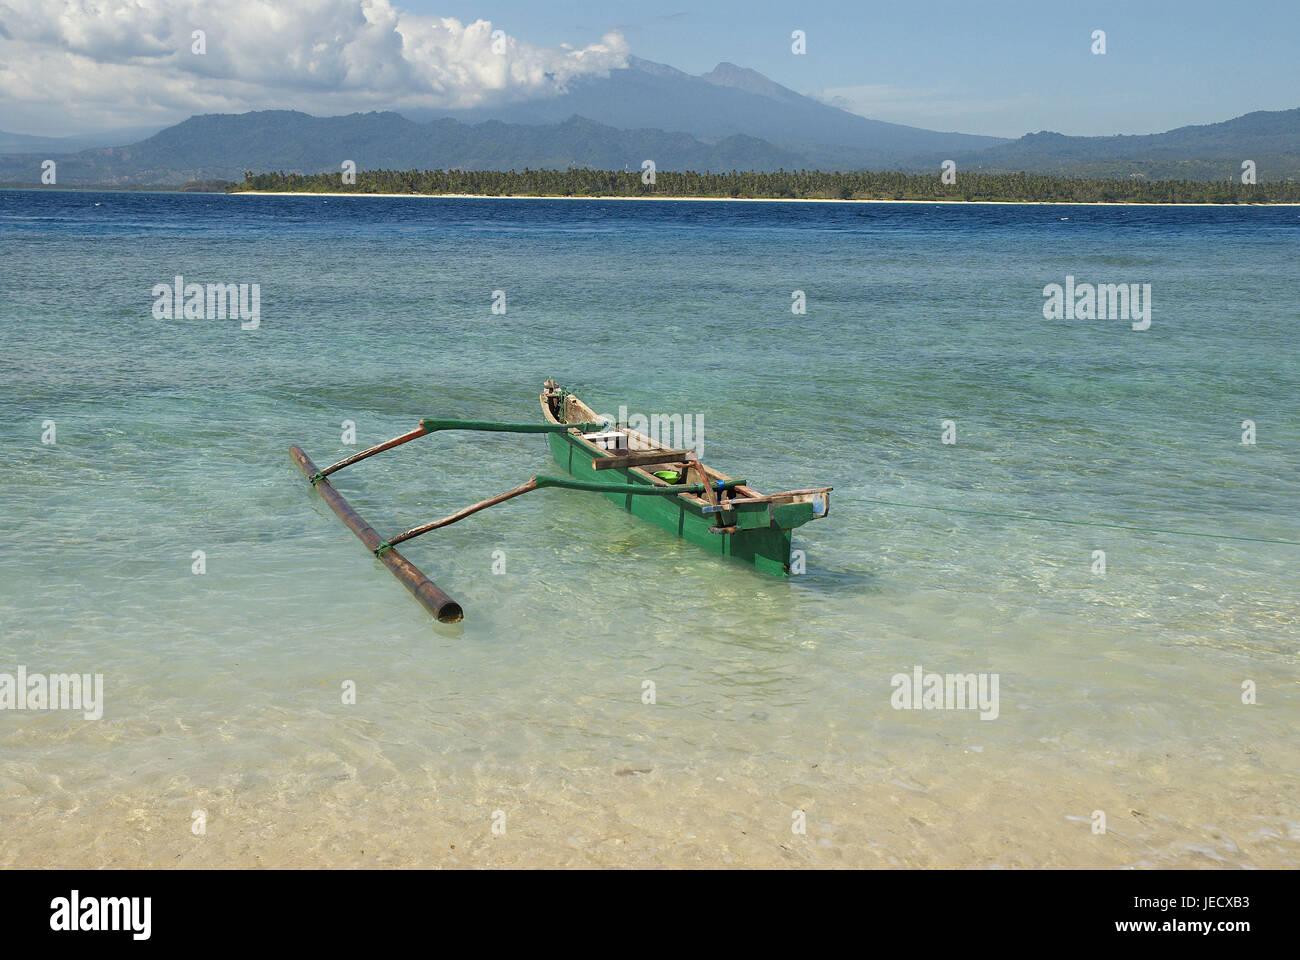 Asia, Indonesia, interpreter boot on the beach, - Stock Image